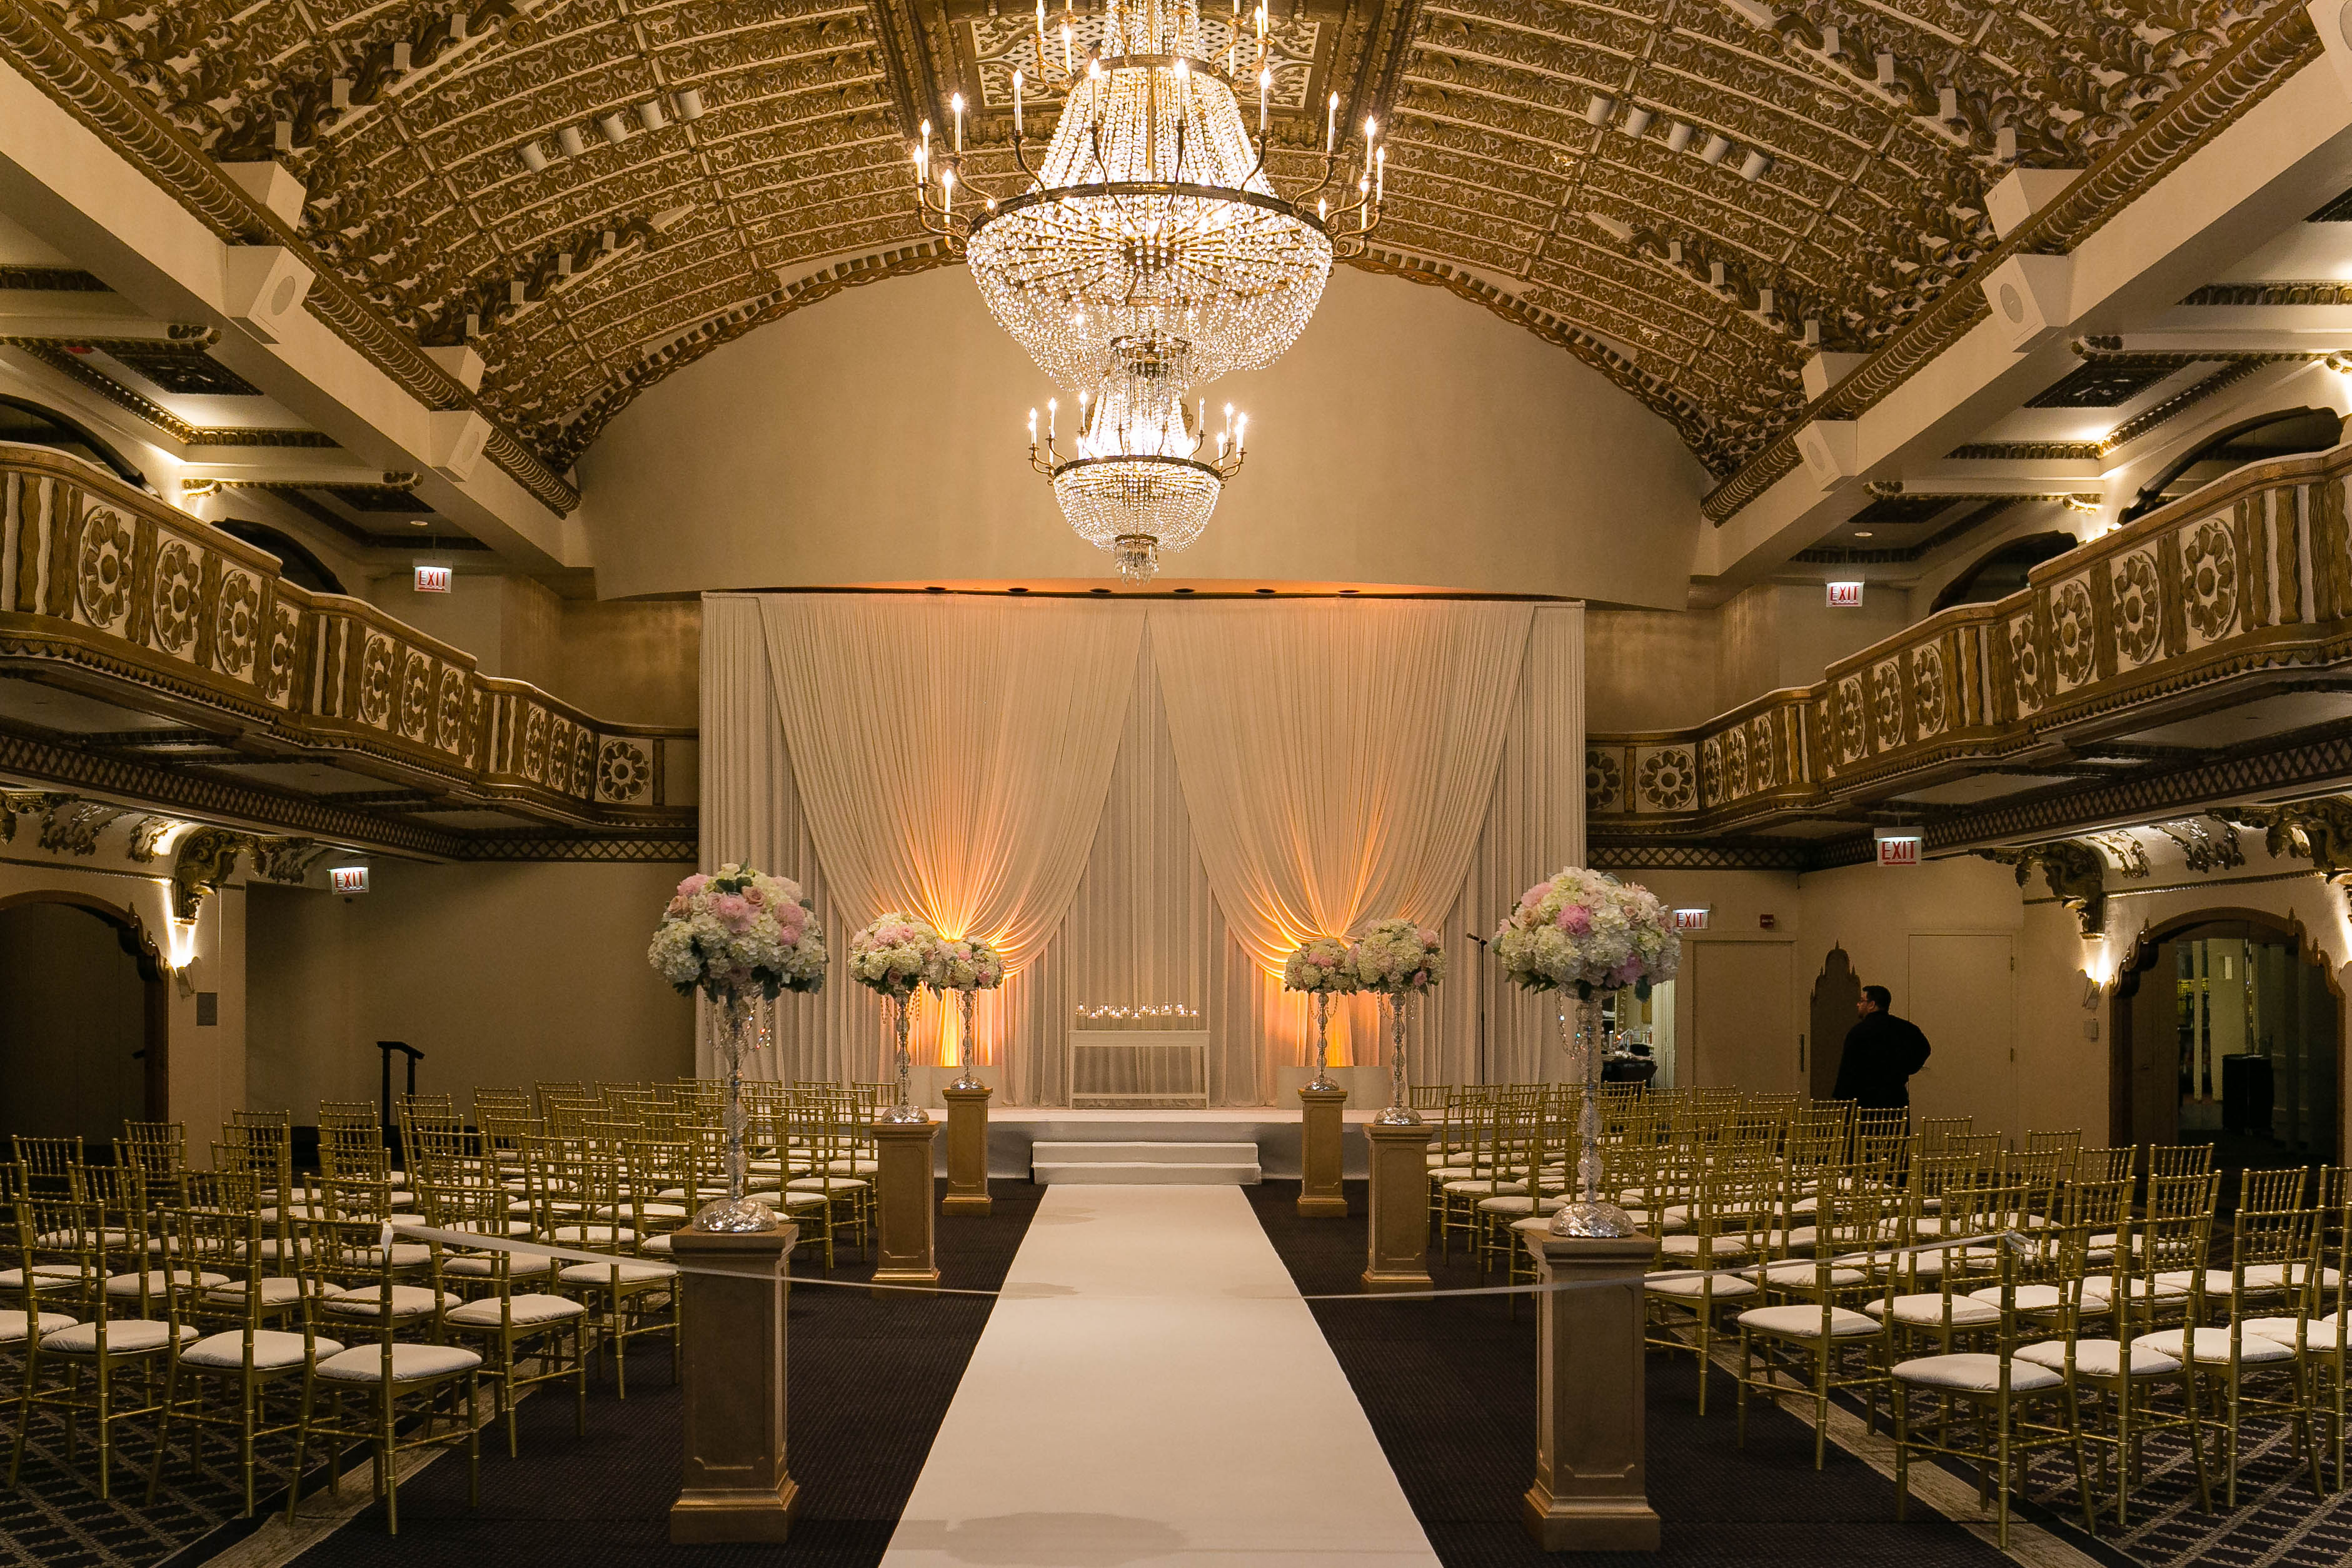 Purdue ballroom wedding